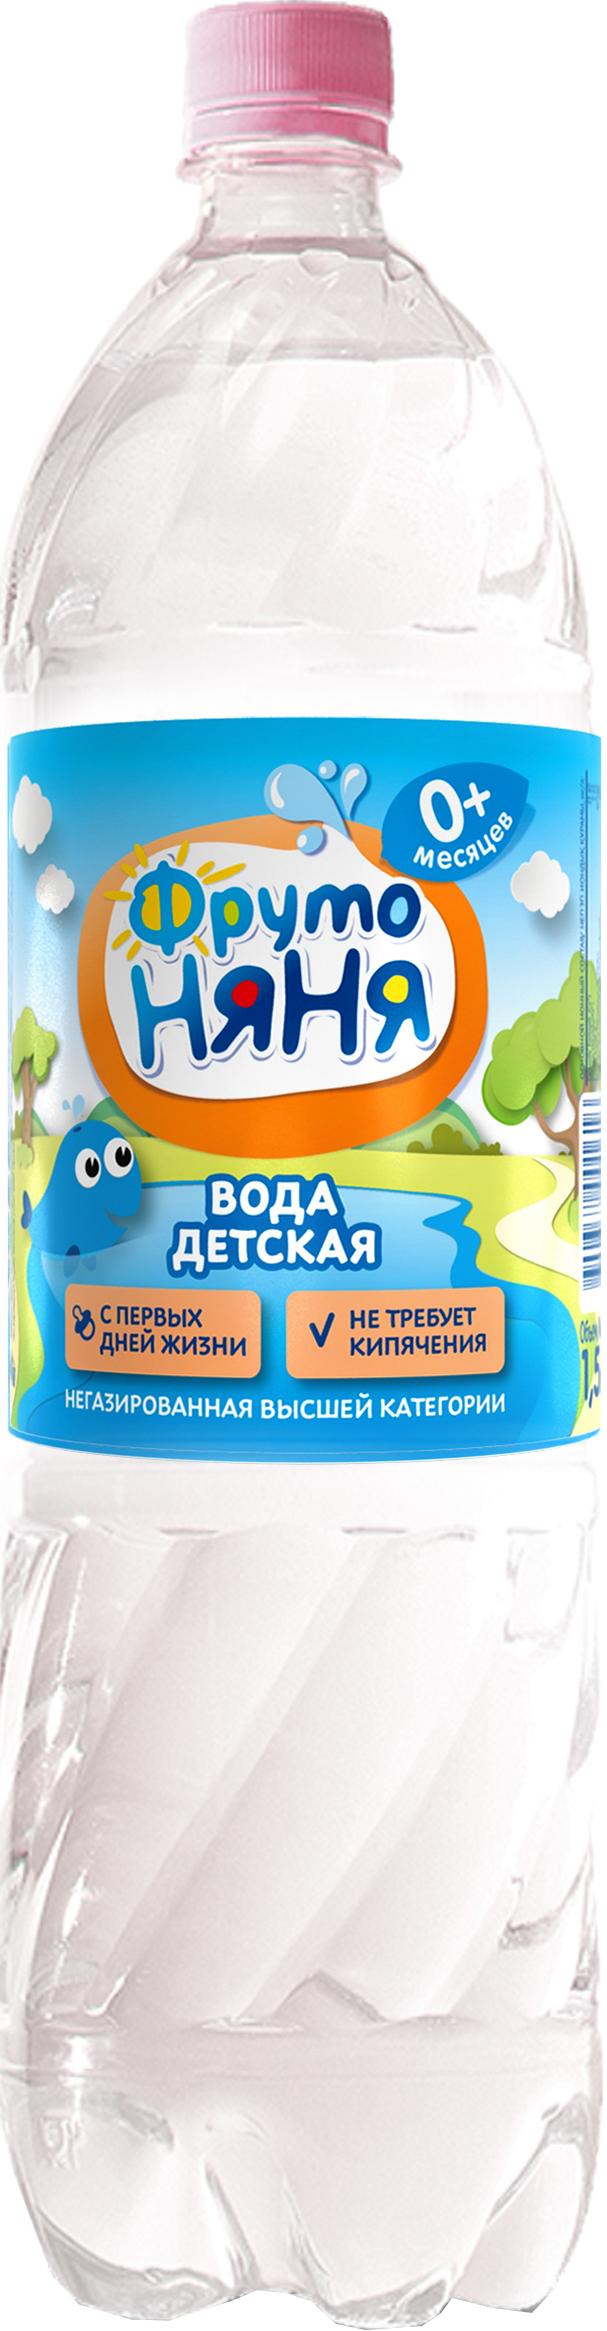 Вода Фрутоняня Вода ФрутоНяня 1,5 л молоко фрутоняня 2 5% с 3 лет 500 мл